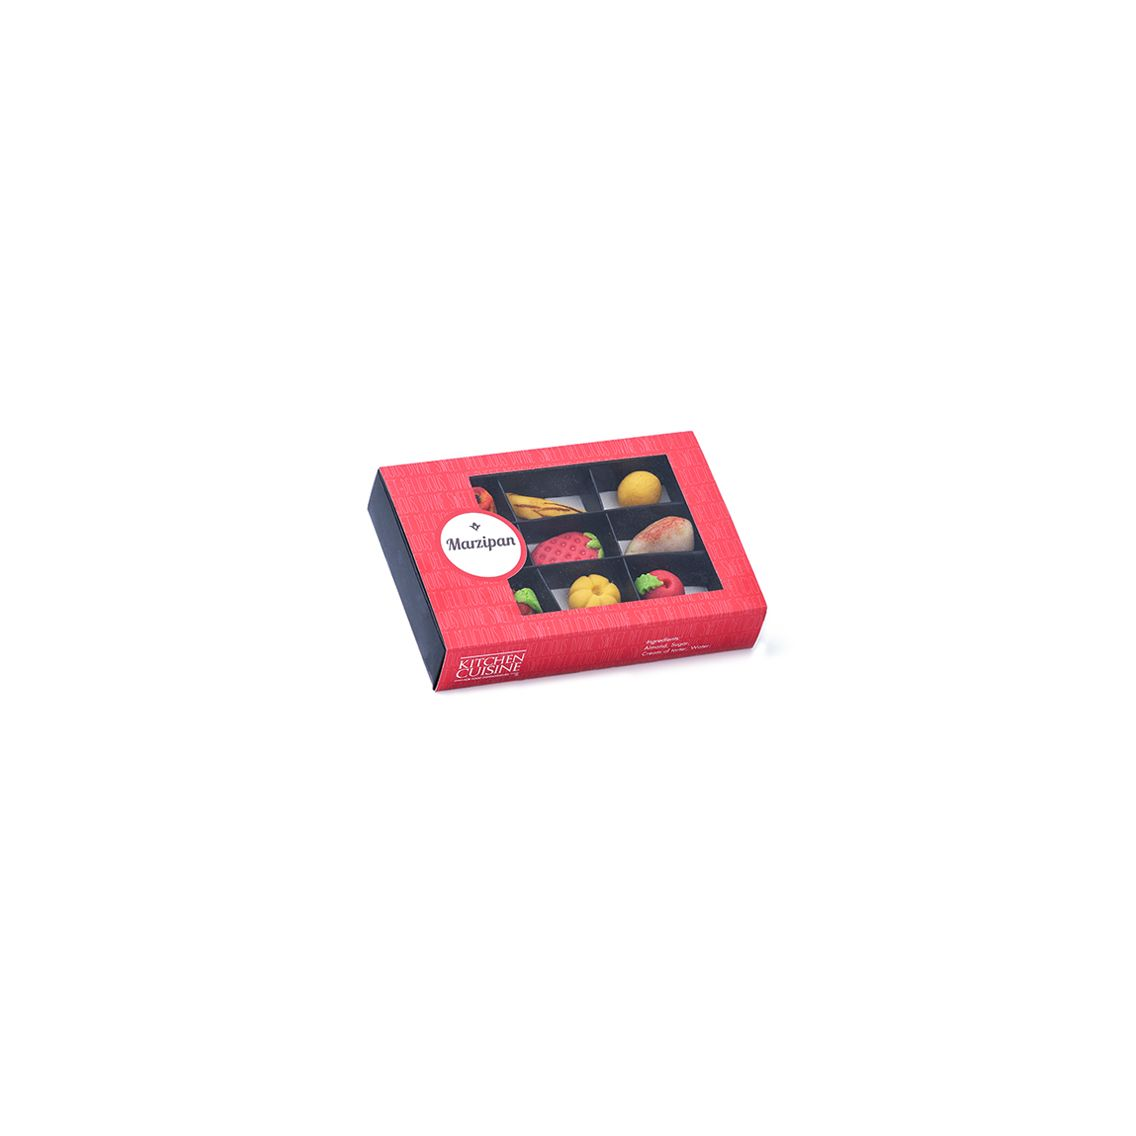 Kitchen Cuisine Default Category Marzipan (box)